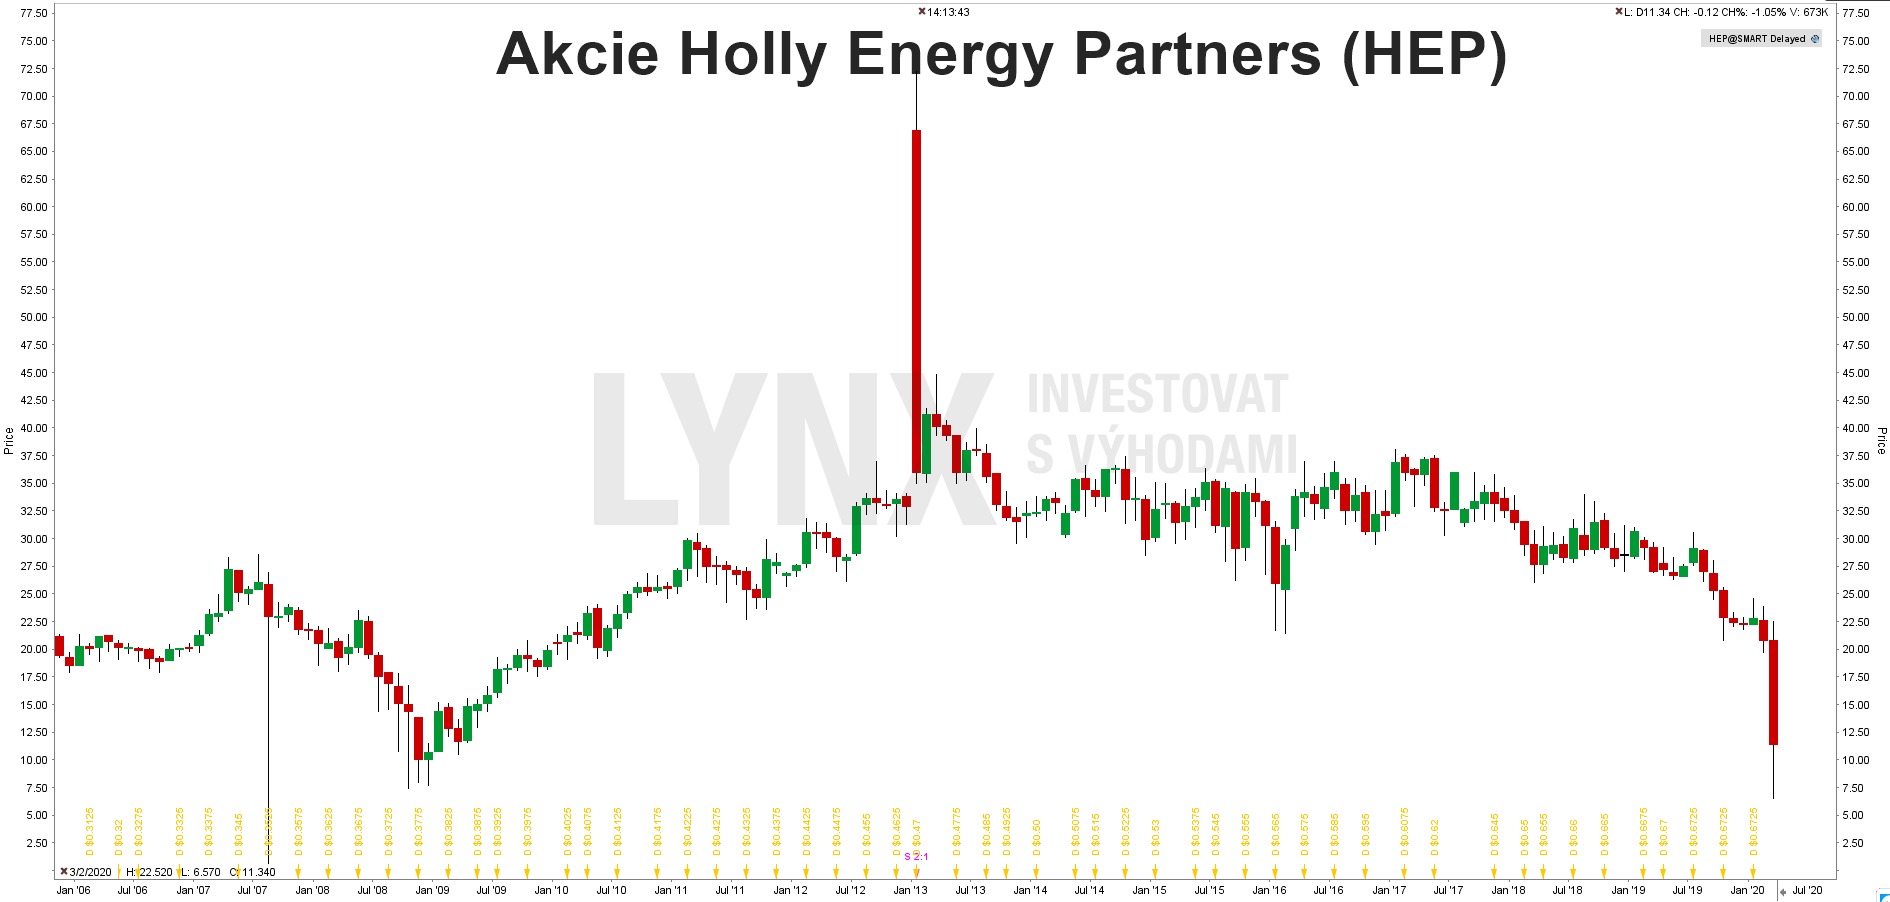 Akcie Holly Energy Partners (HEP)